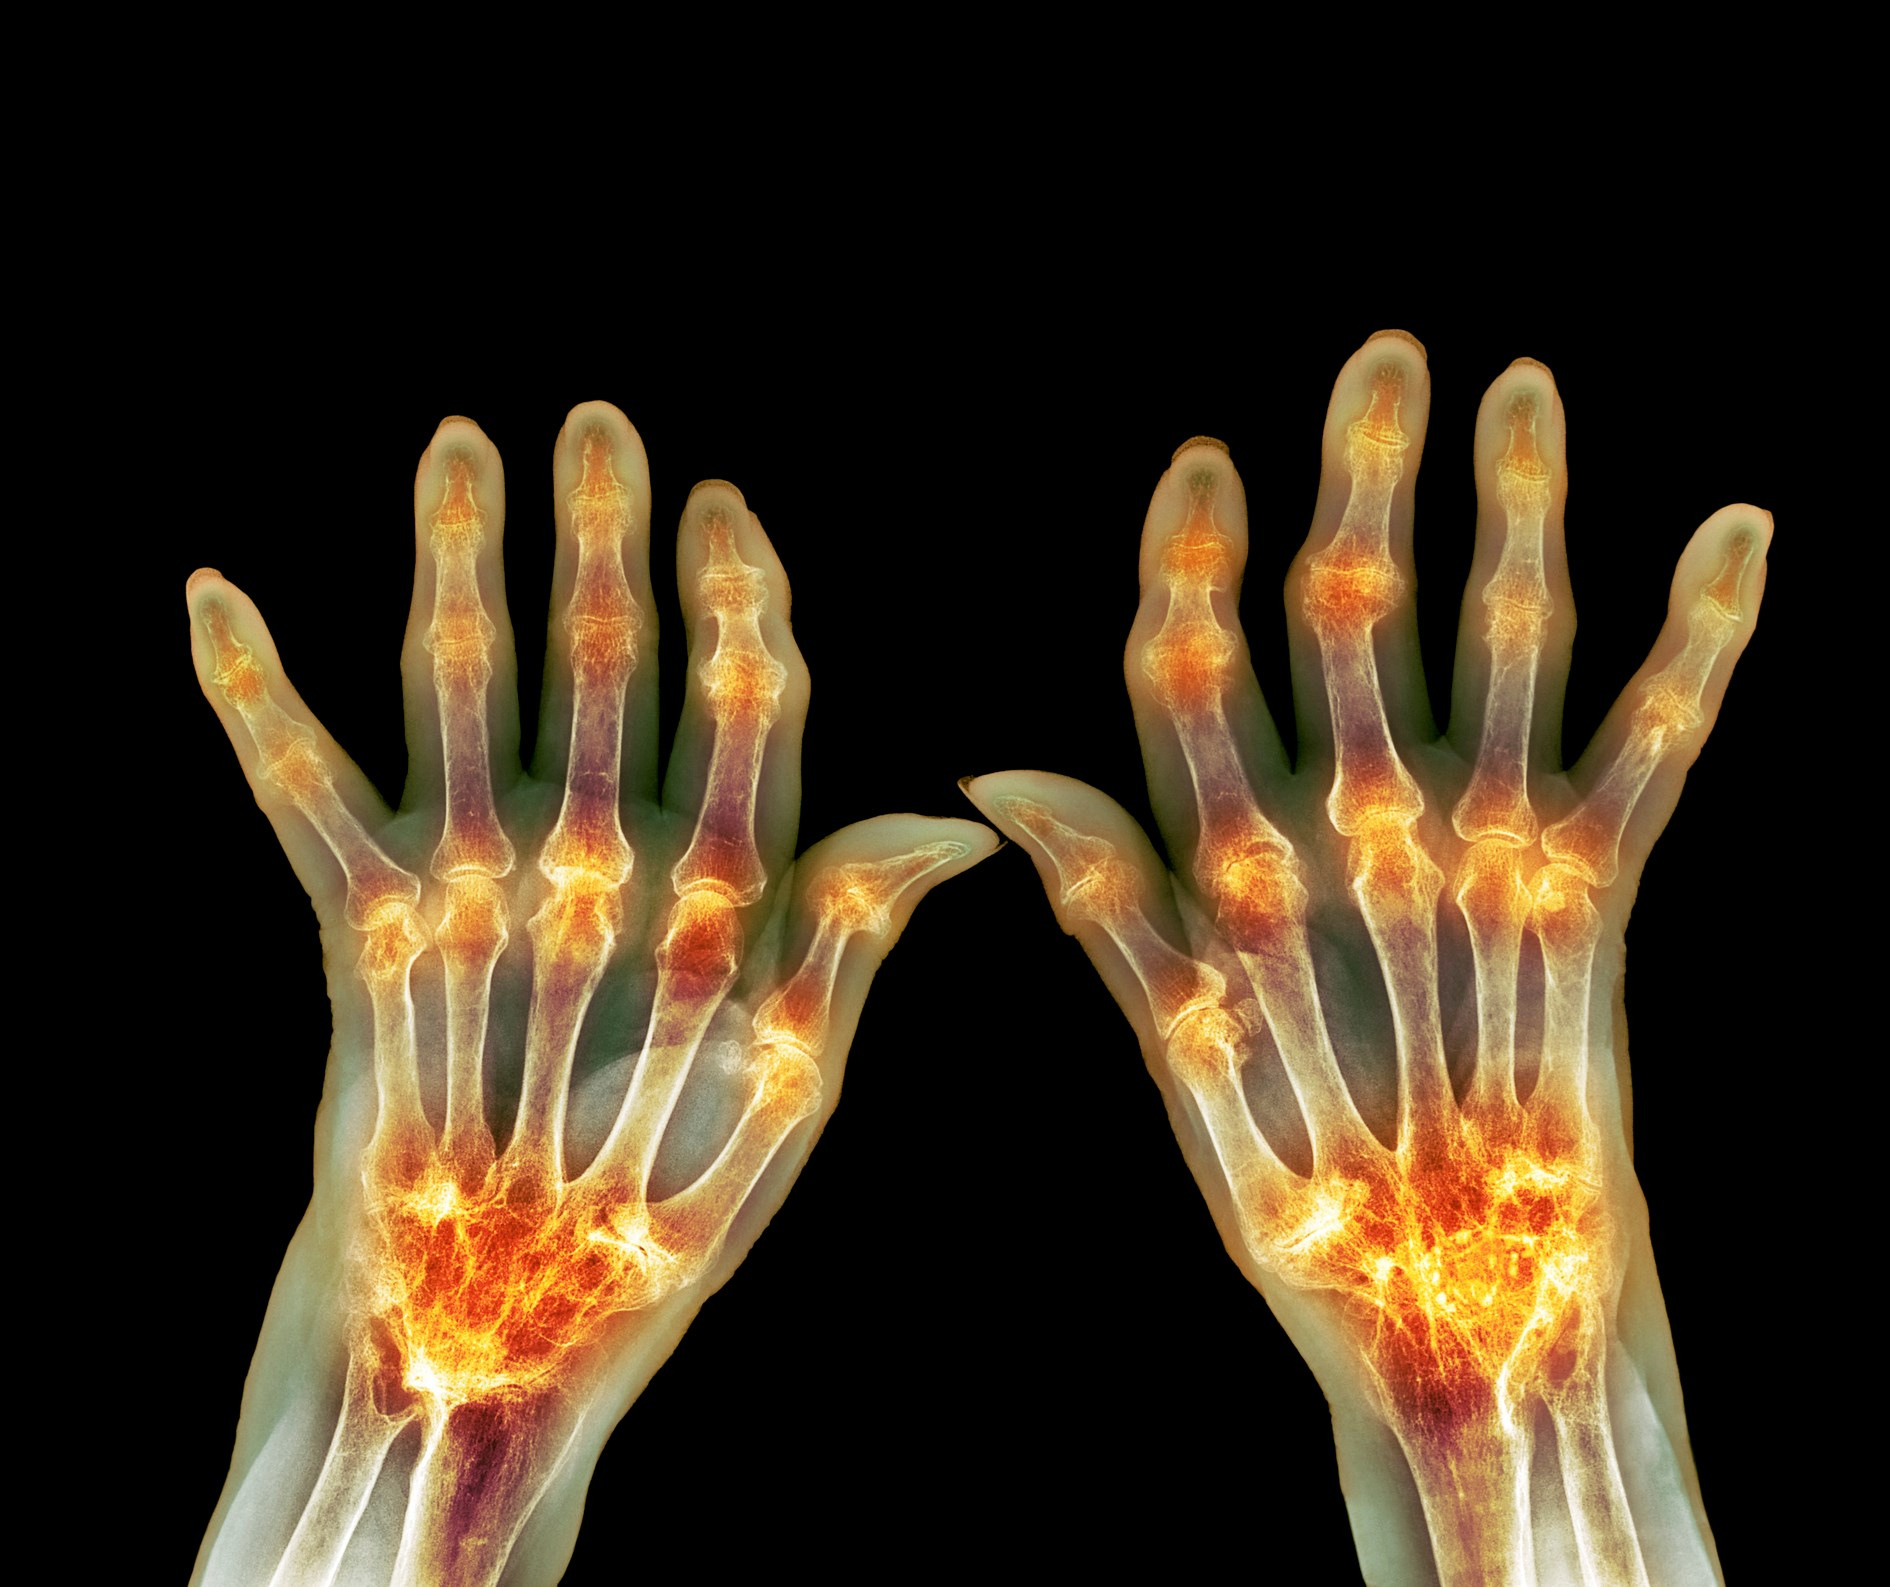 Chronic Inflammatory Disorders May Increase Cardiometabolic, Mortality Risks